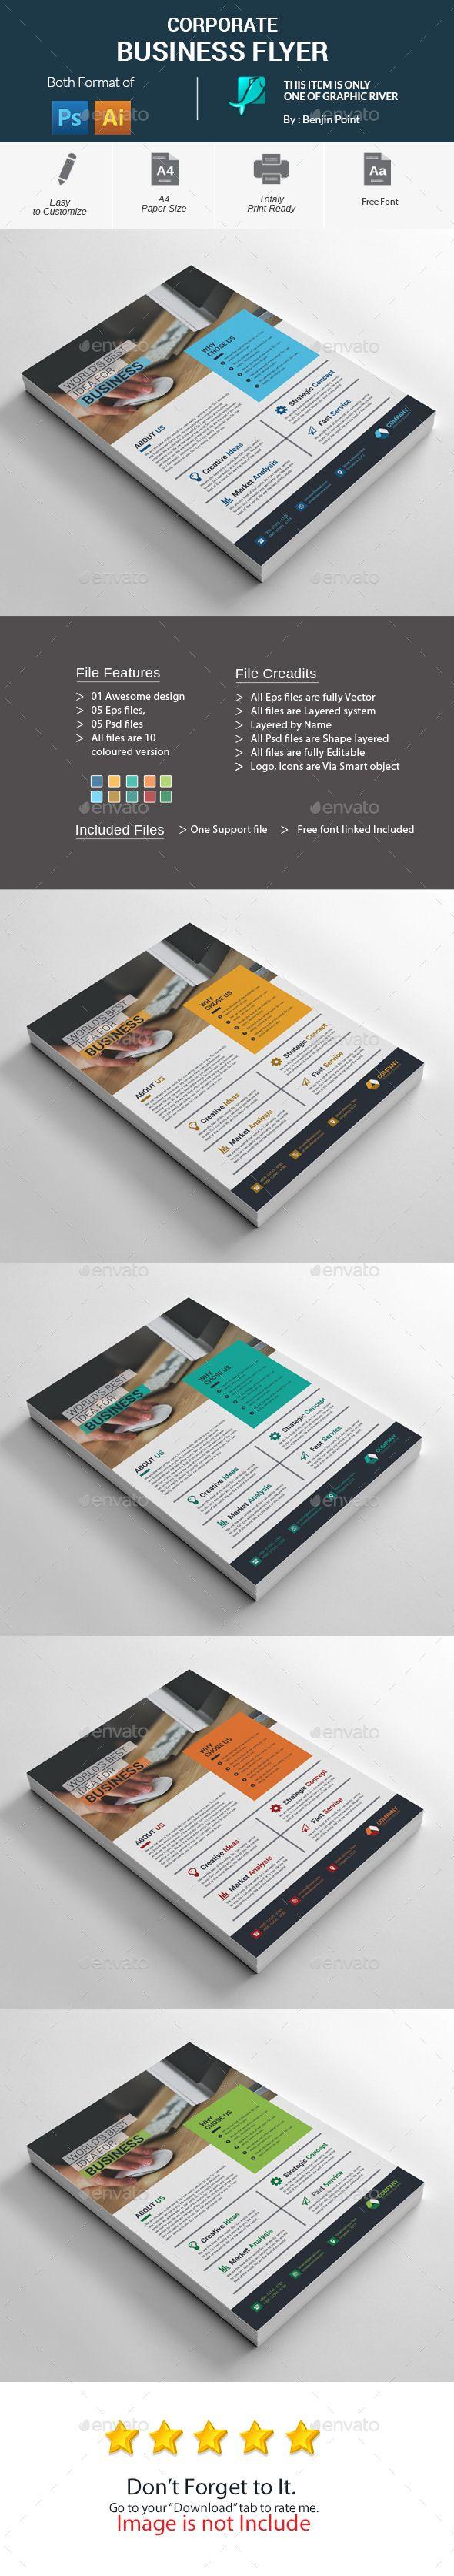 Corporate Business Flyer Template PSD, Vector EPS, AI Illustrator